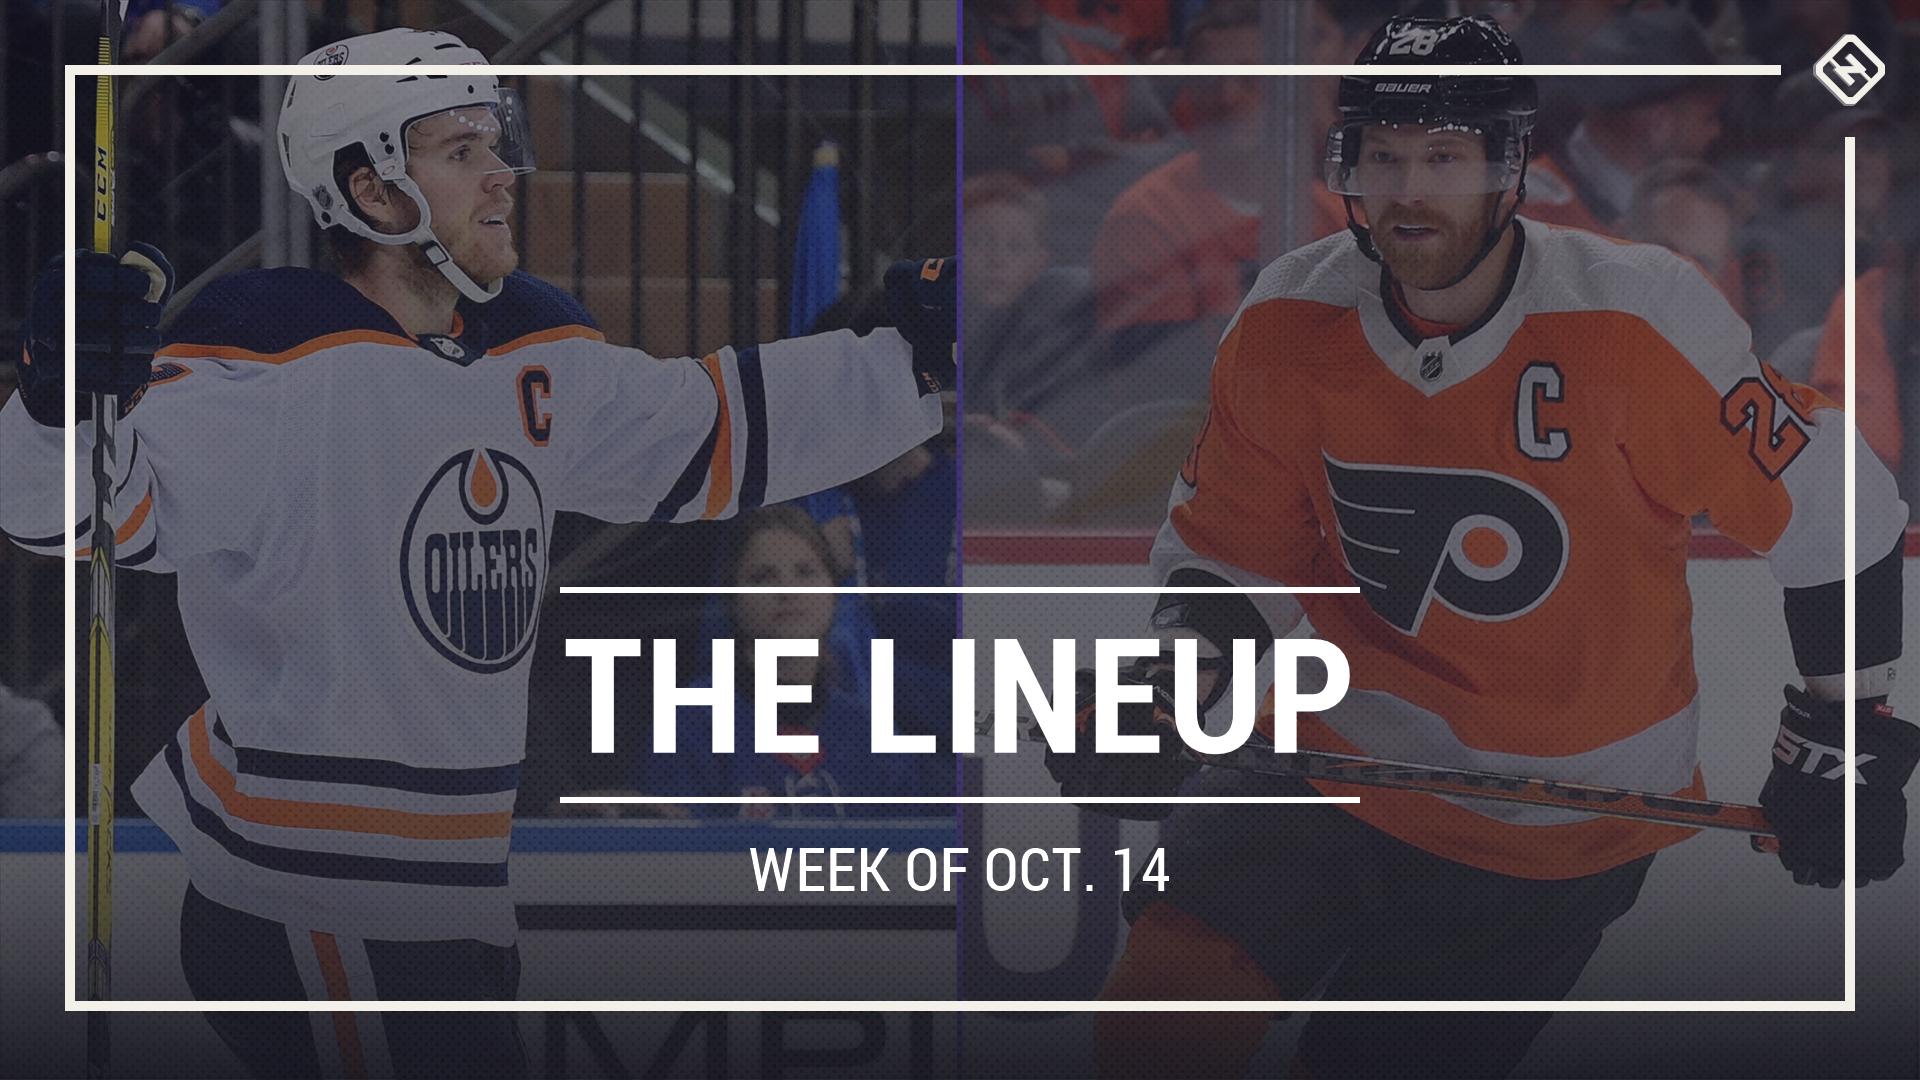 The Lineup: Edmonton Oilers test top-notch start against Philadelphia Flyers in week of Oct. 14